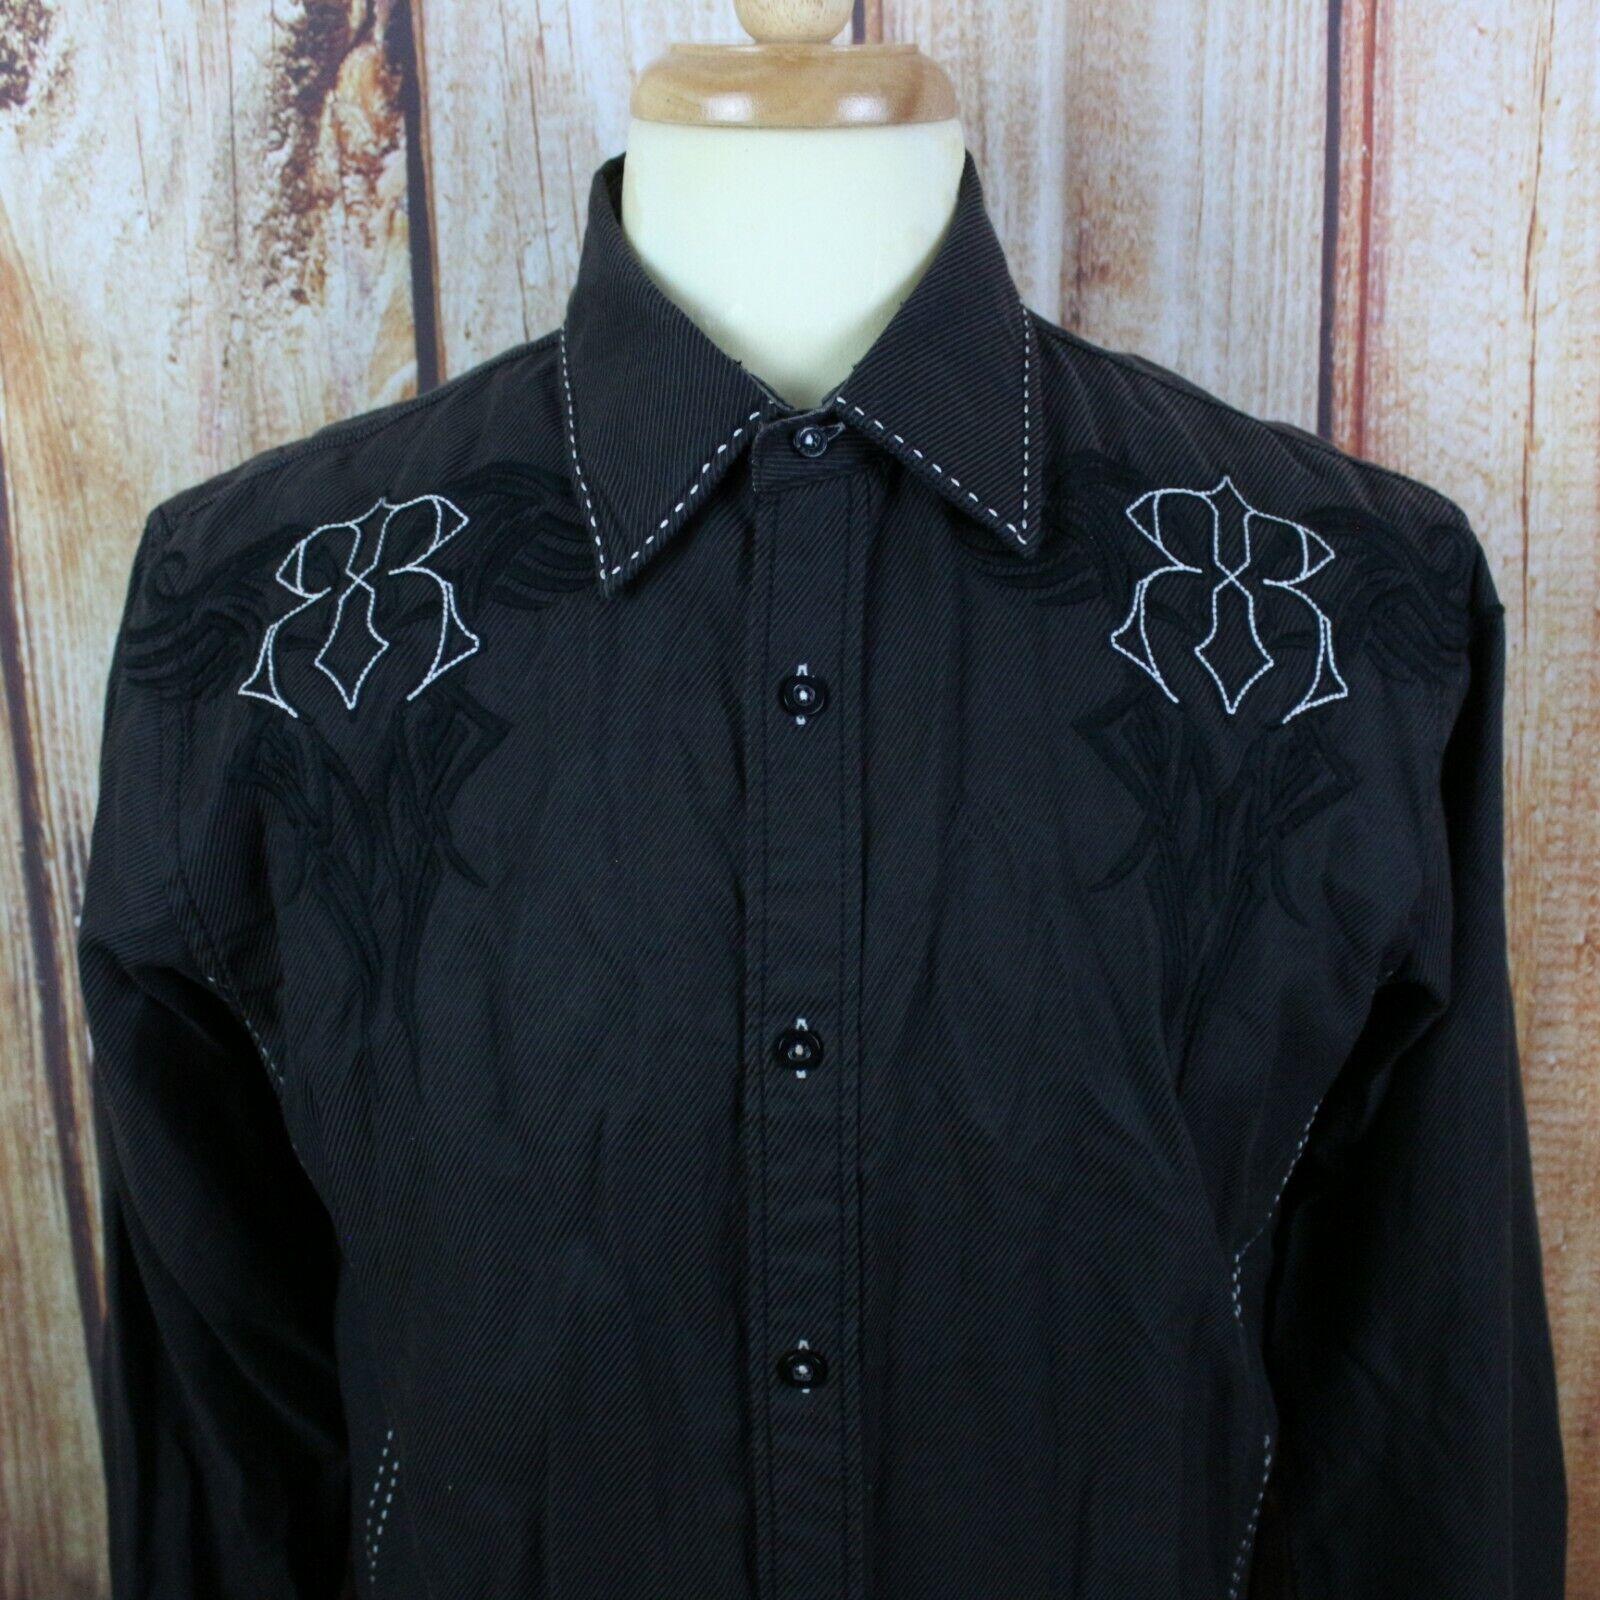 a08acb3b Roar Signature Men's Button Down Embroidered Shirt Sz Medium Brown Long  Sleeve